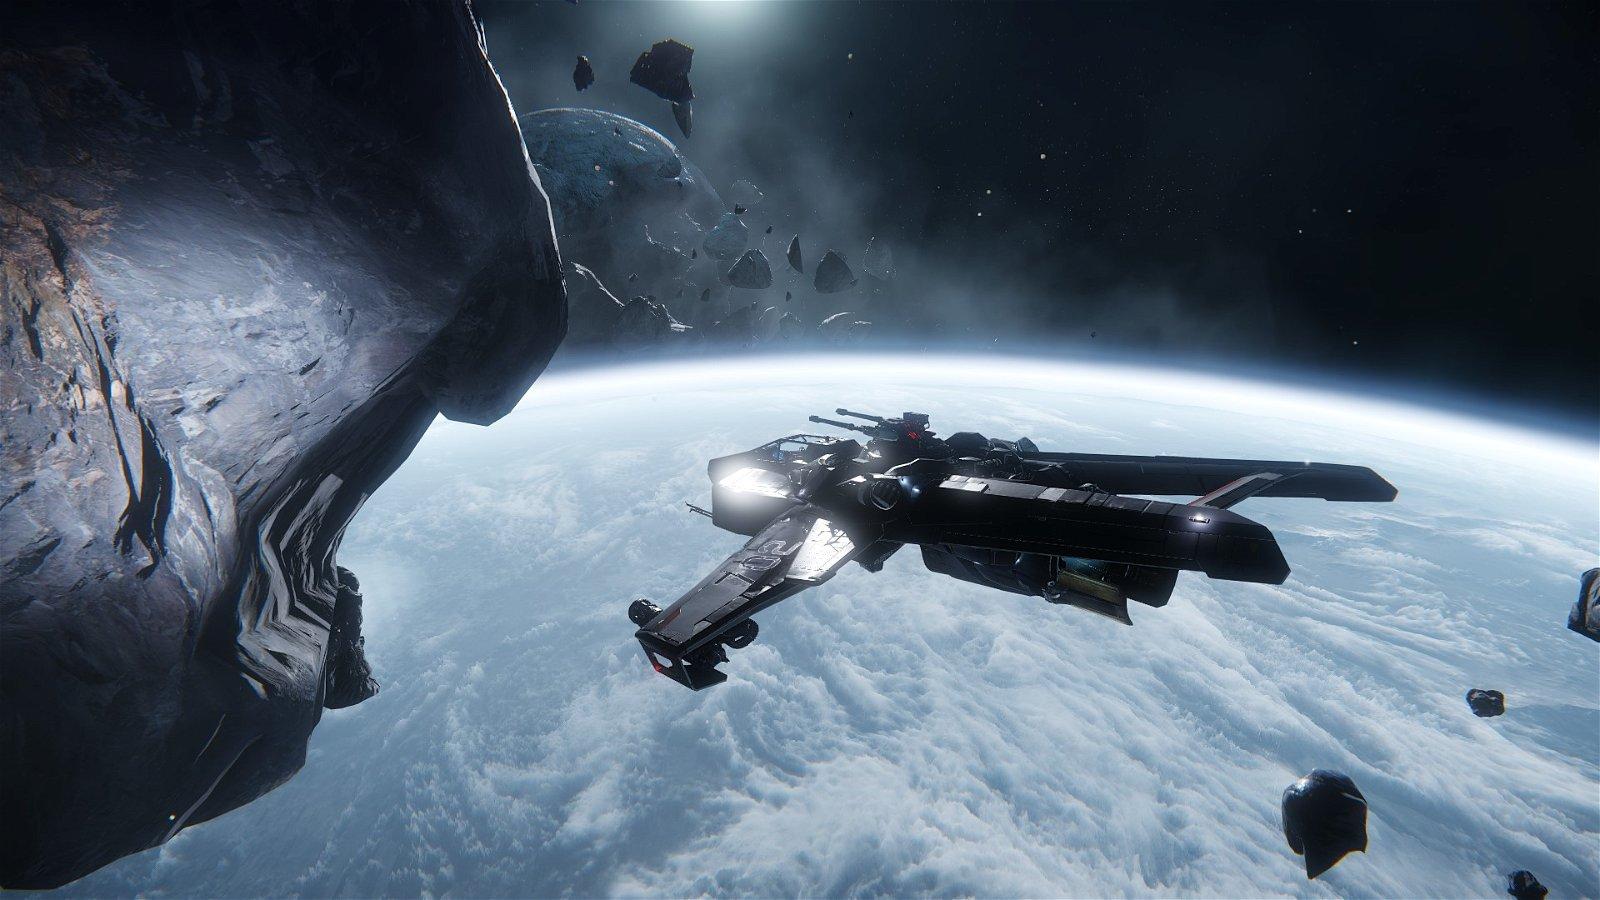 Star Citizen single player game Squadron 42 delayed